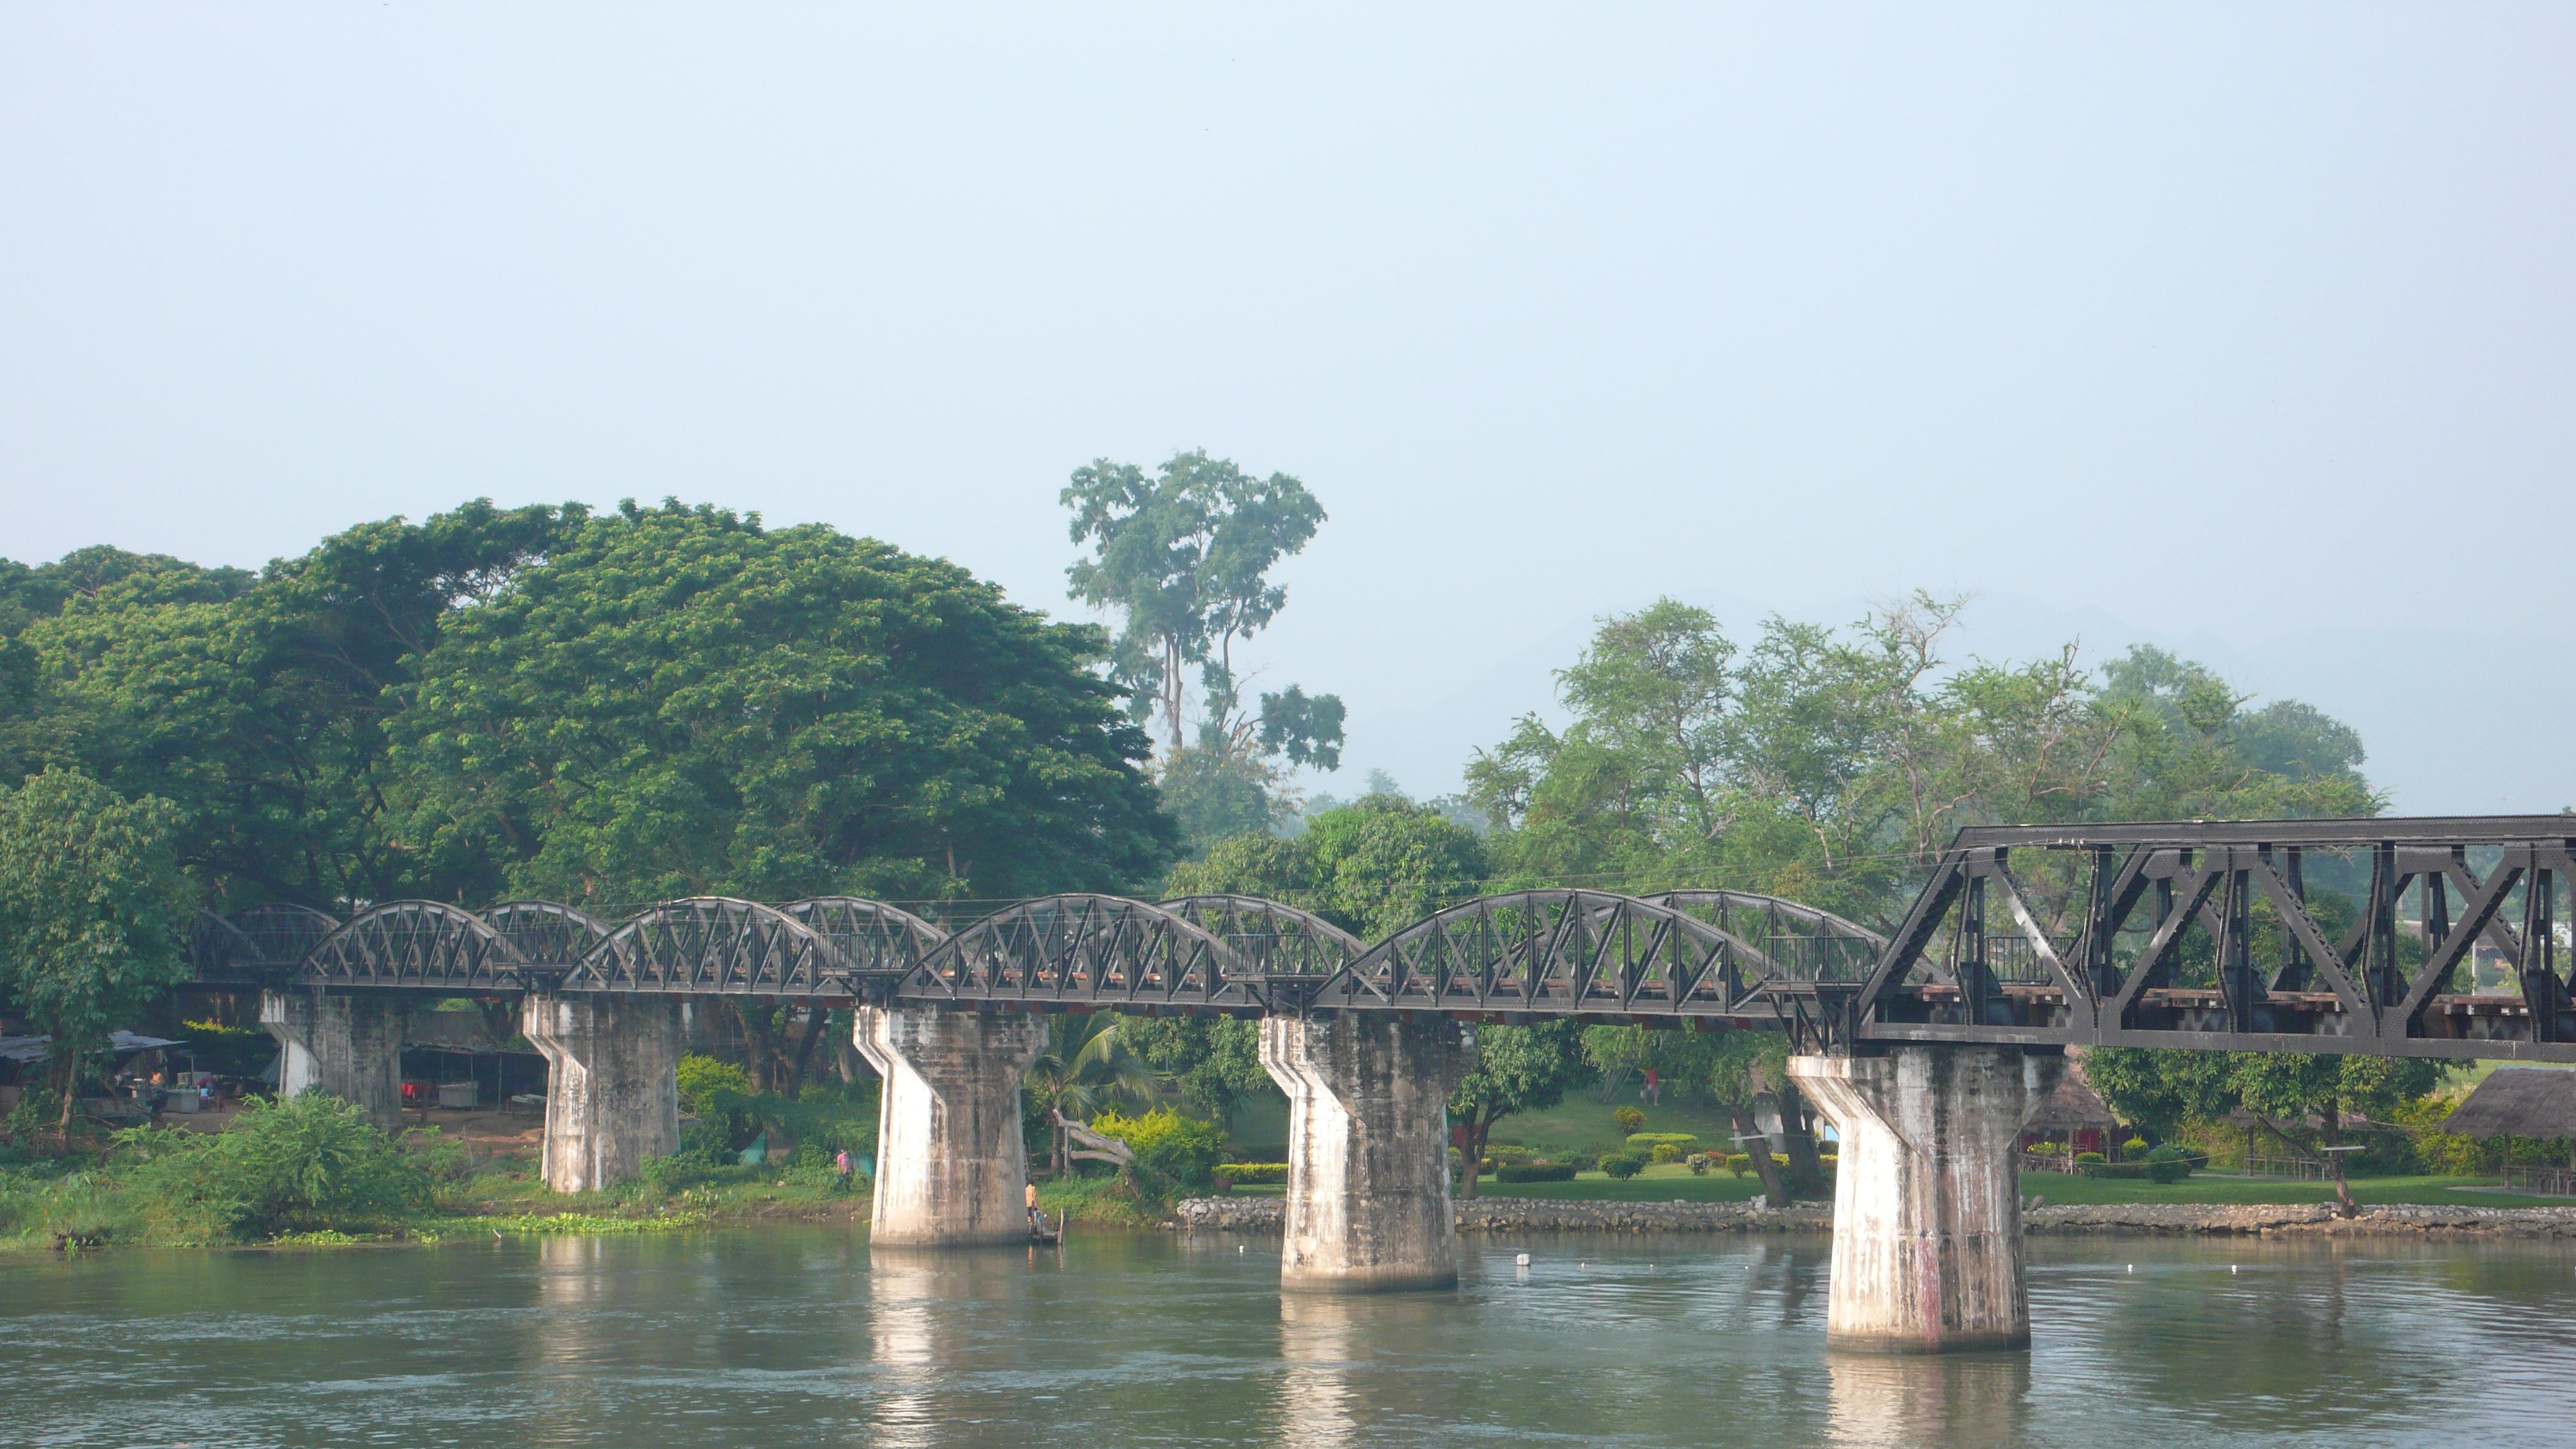 bridge on the river - photo #13